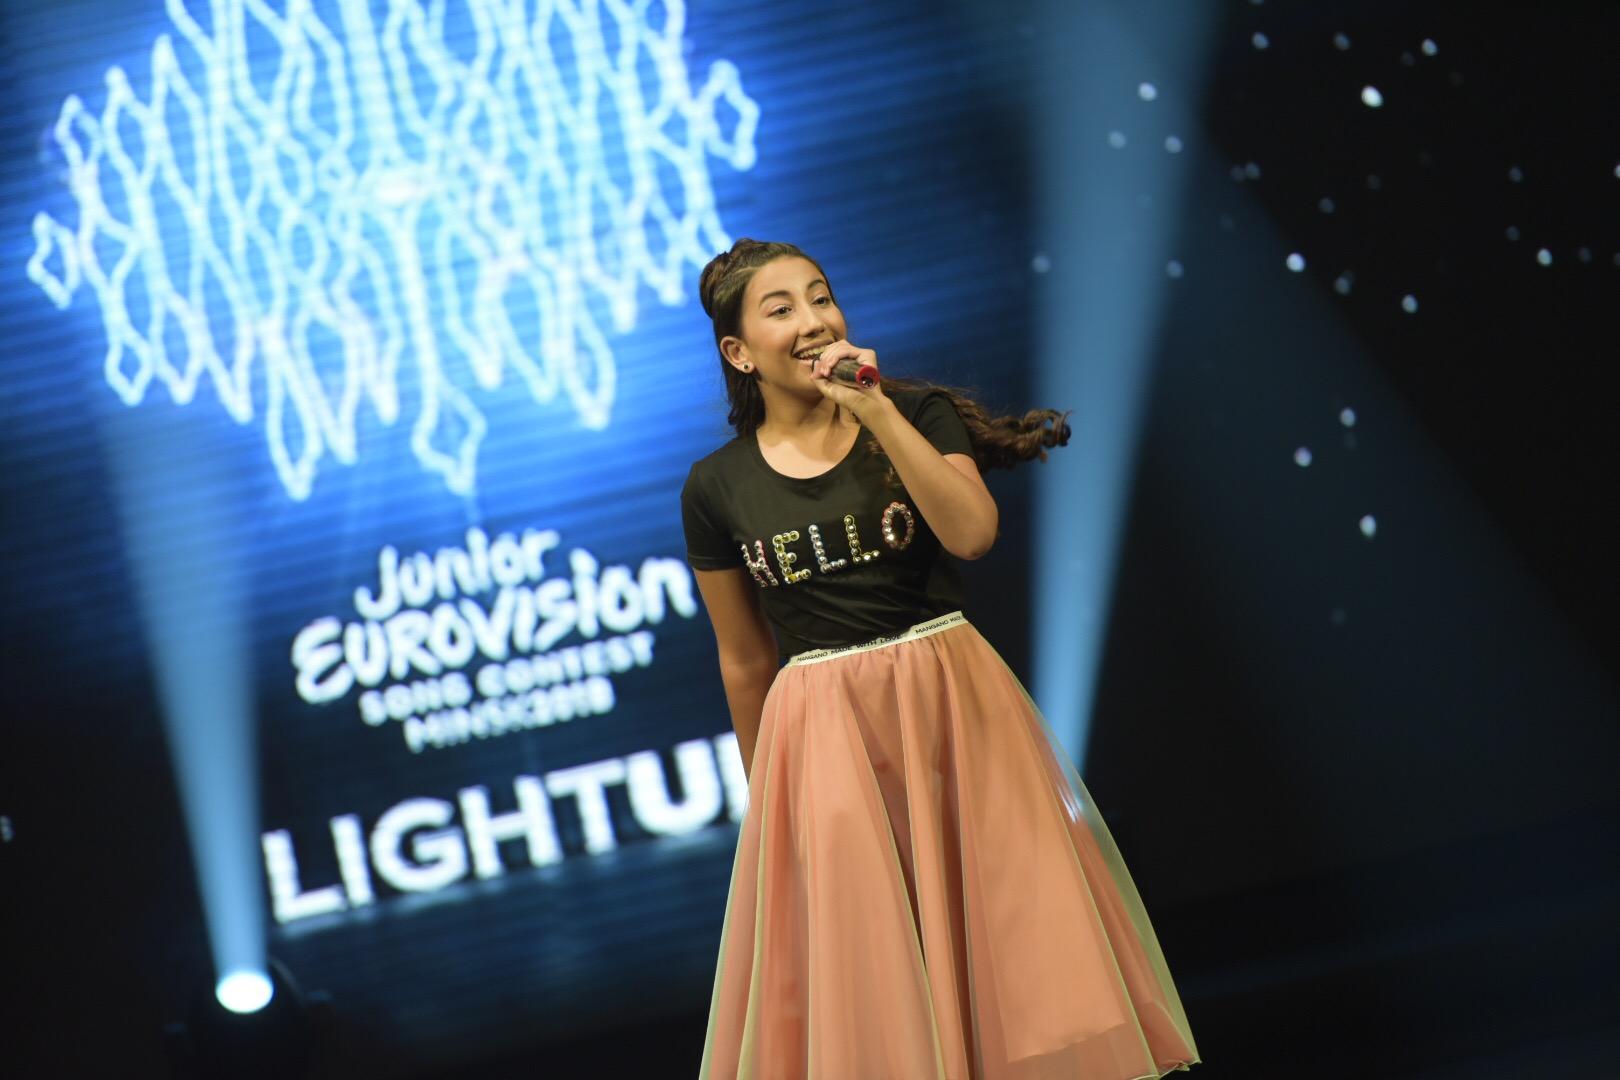 Malta: Ela Mangion to represent the country in Junior Eurovision 2018